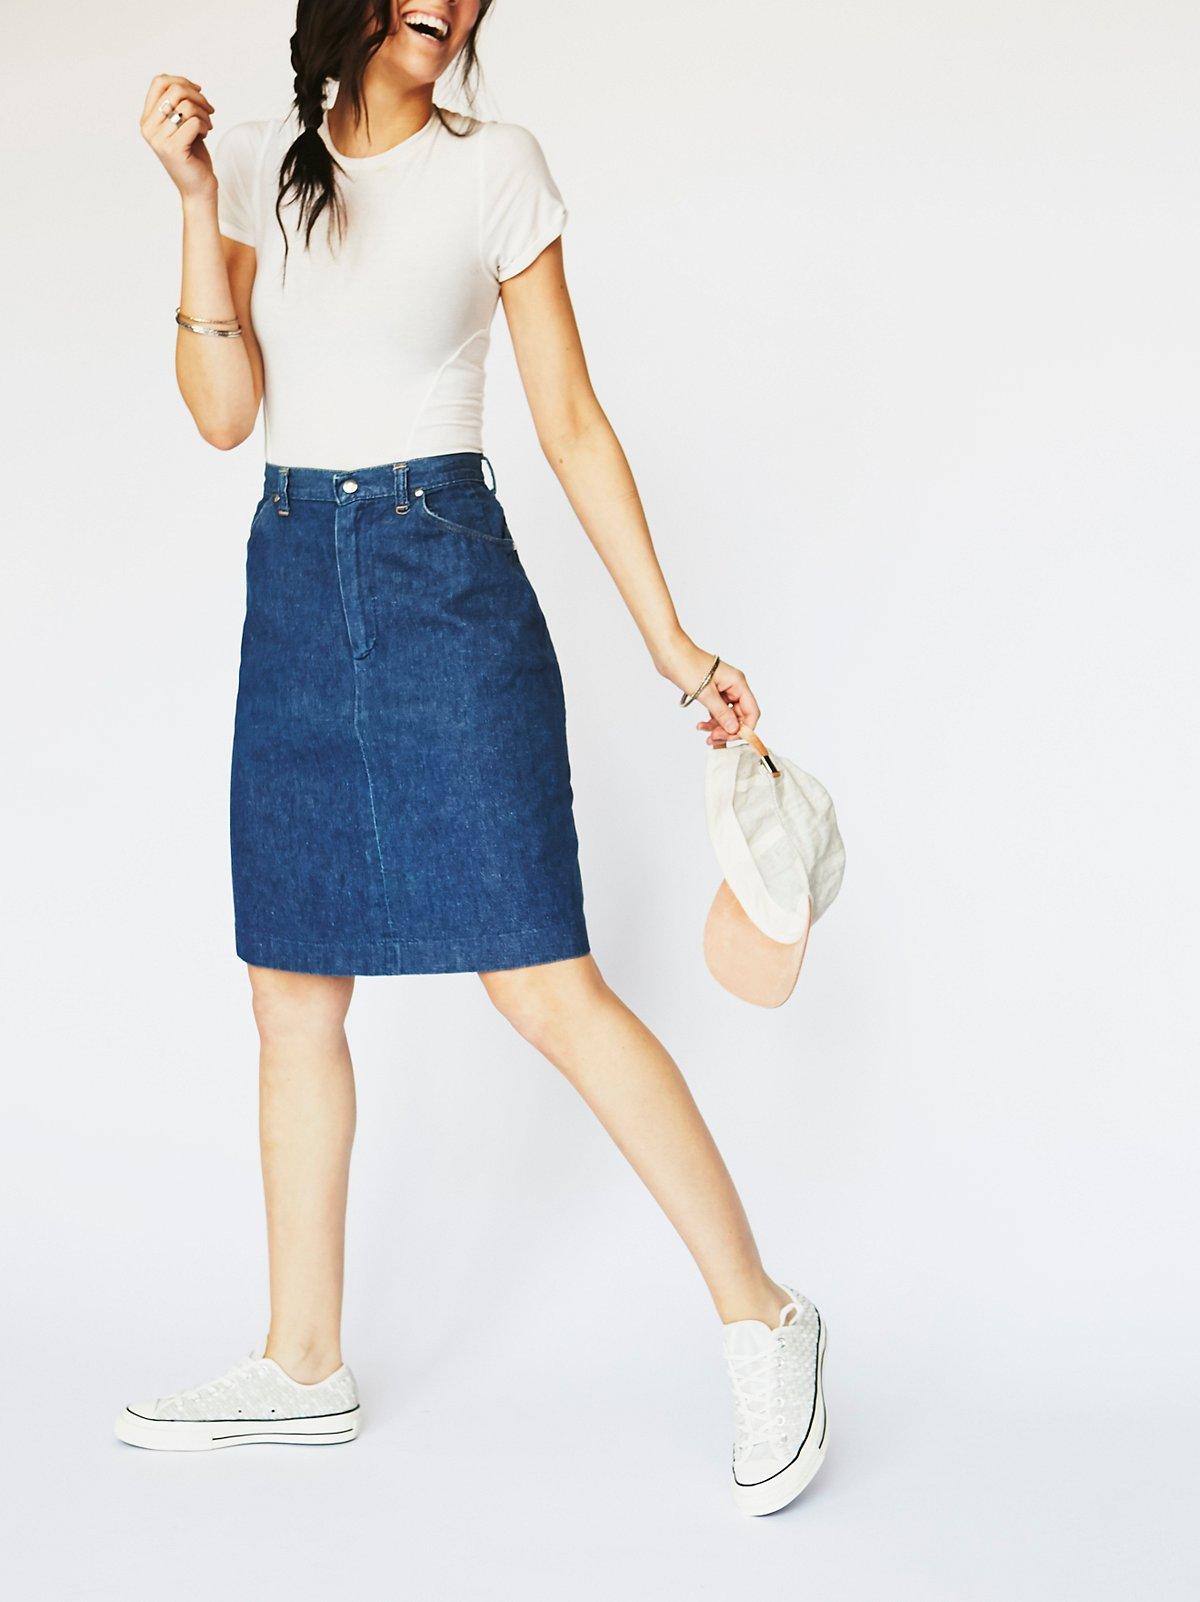 Vintage 1970s Denim Skirt